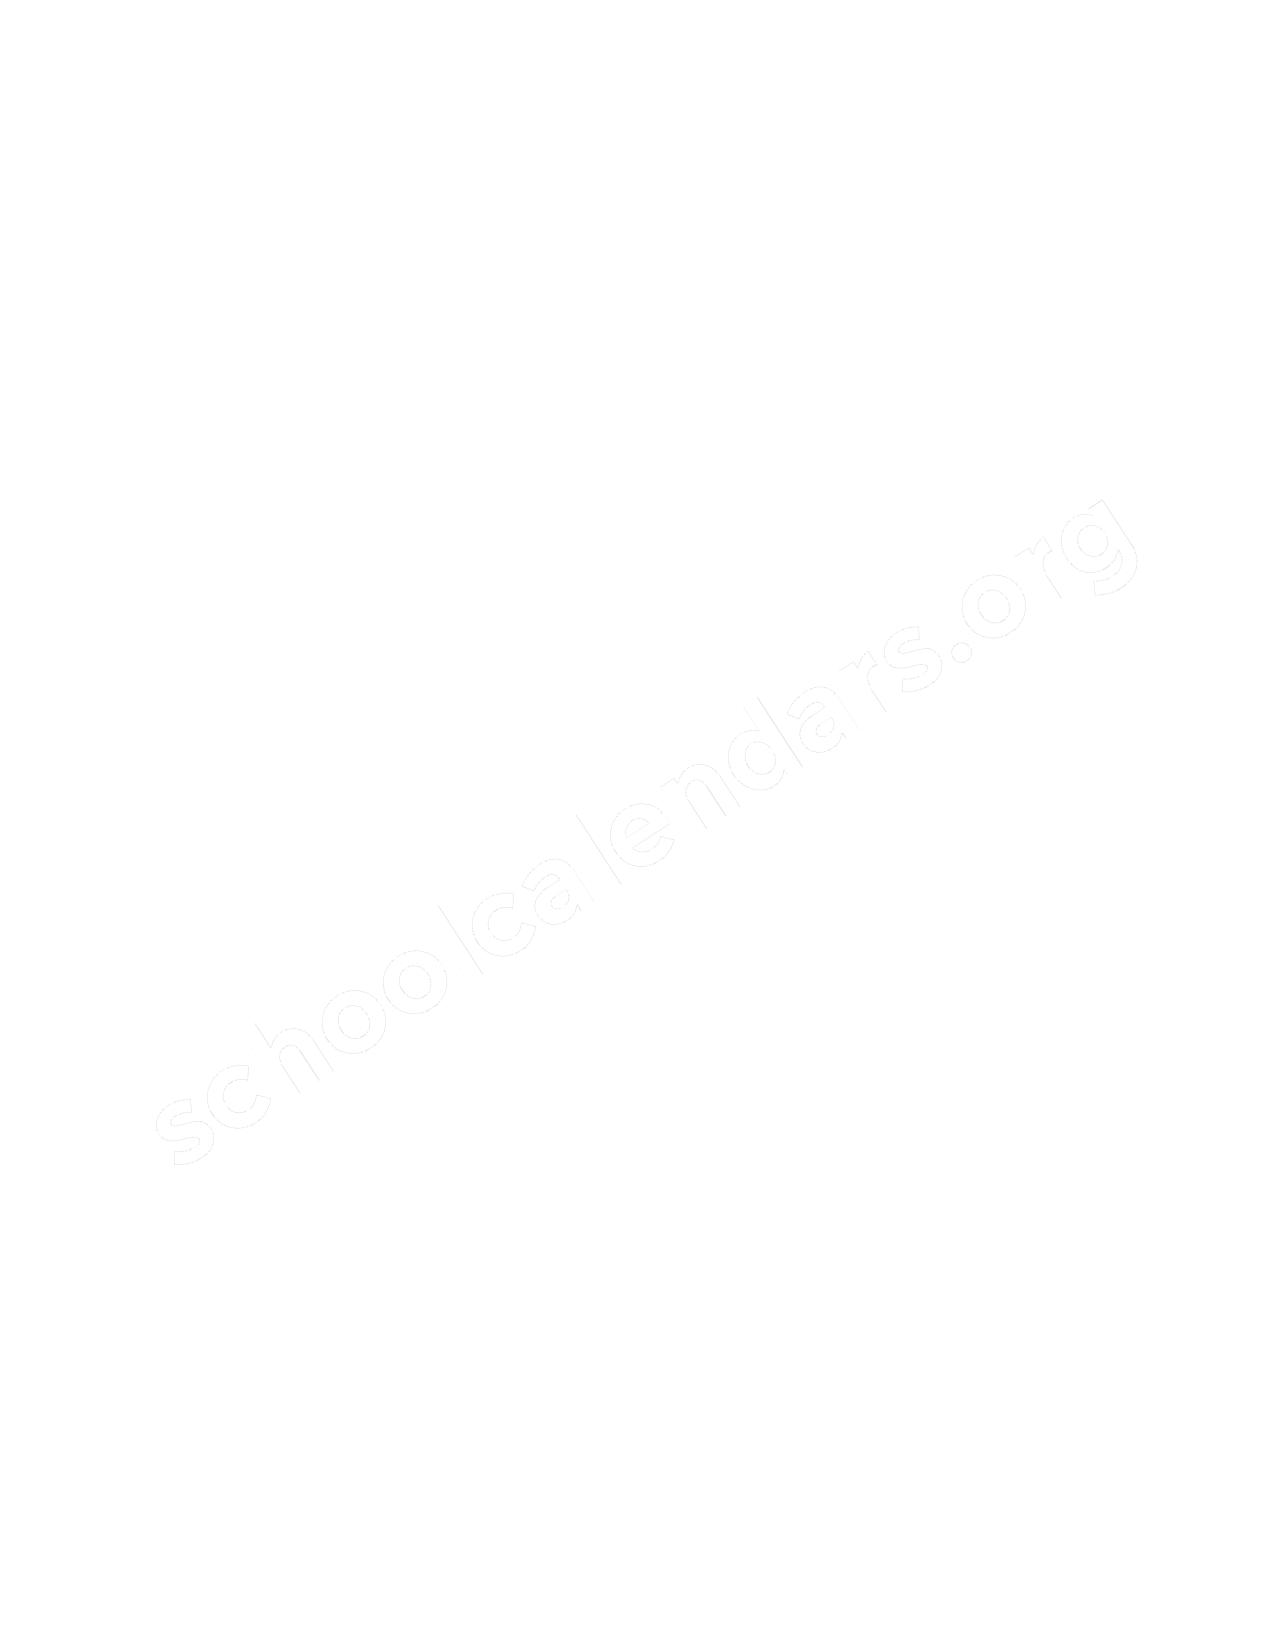 2018 - 2019 School Calendar – West Milford Township Public Schools – page 2